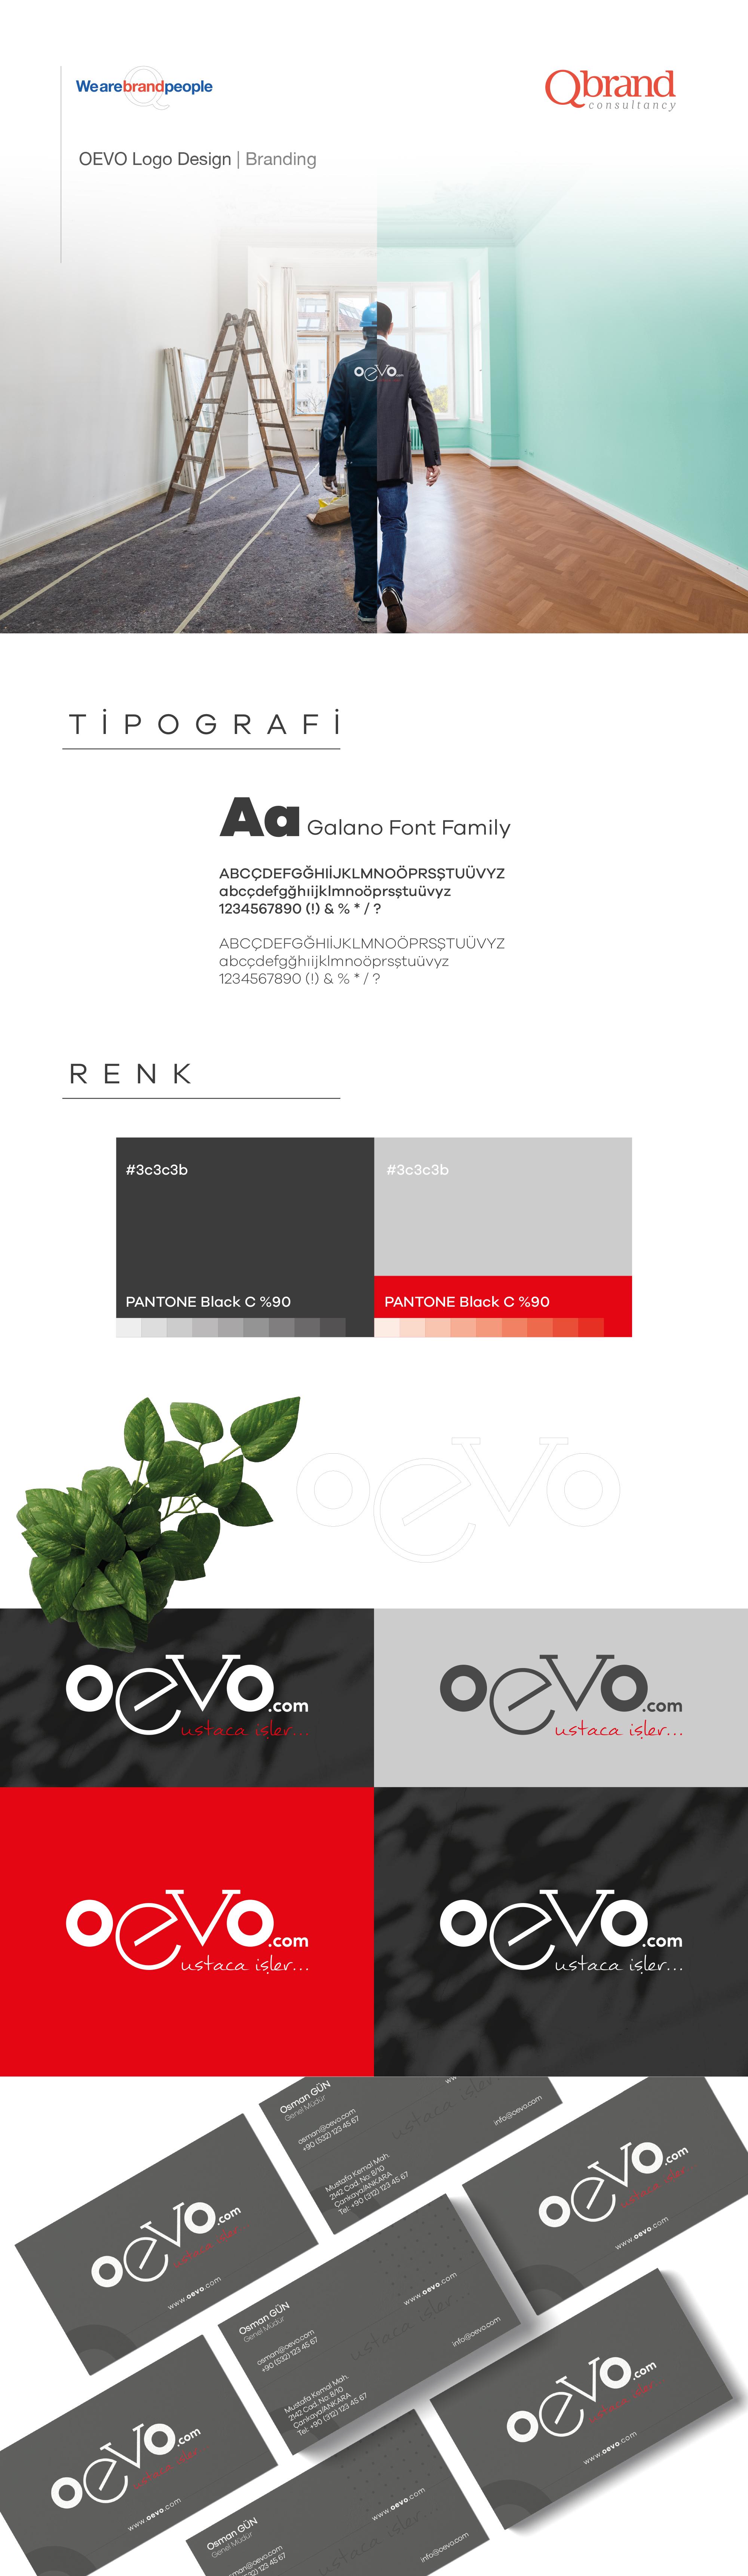 Ankara kurumsal kimlik tasarımı  Oevo